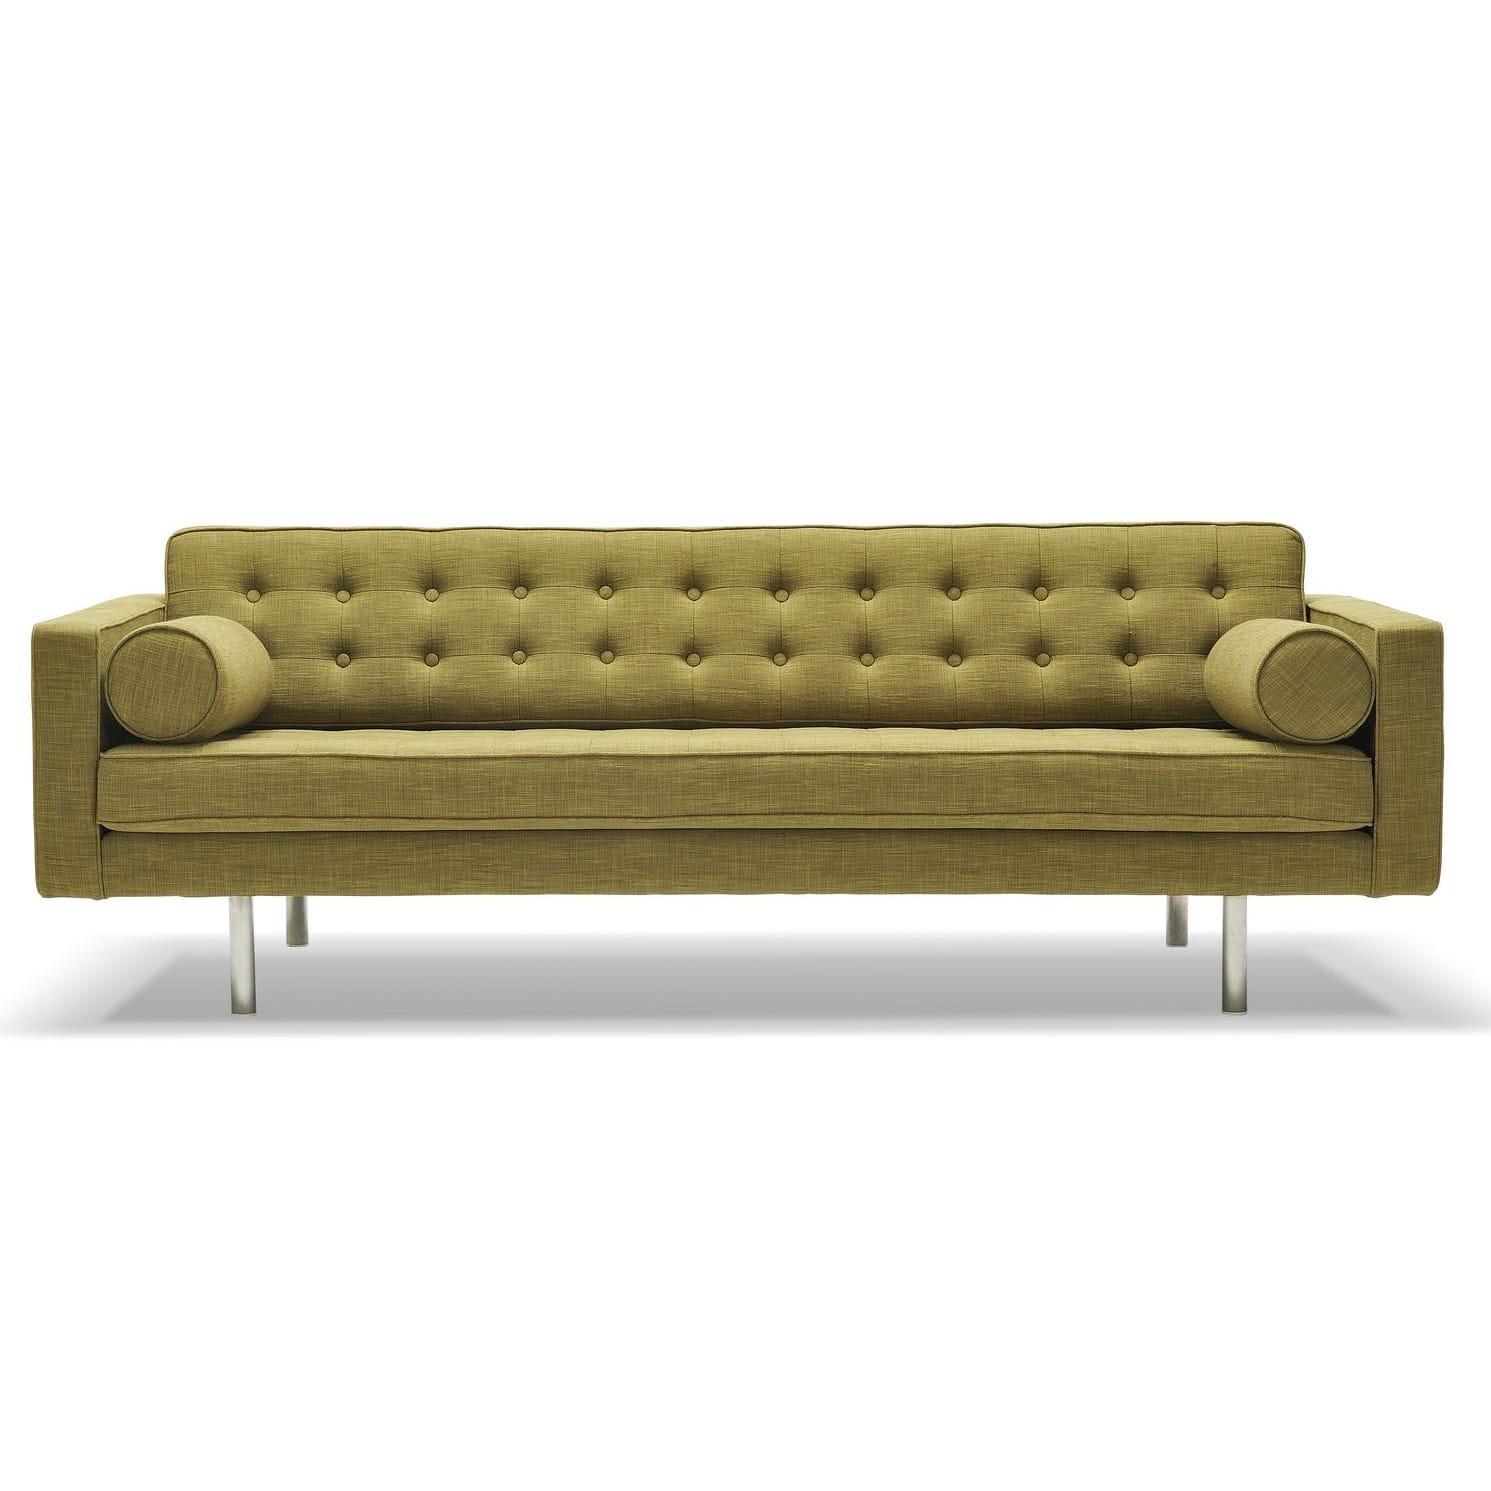 Floor Sample Bulgaria Commercial Grade Sofa By New Spec